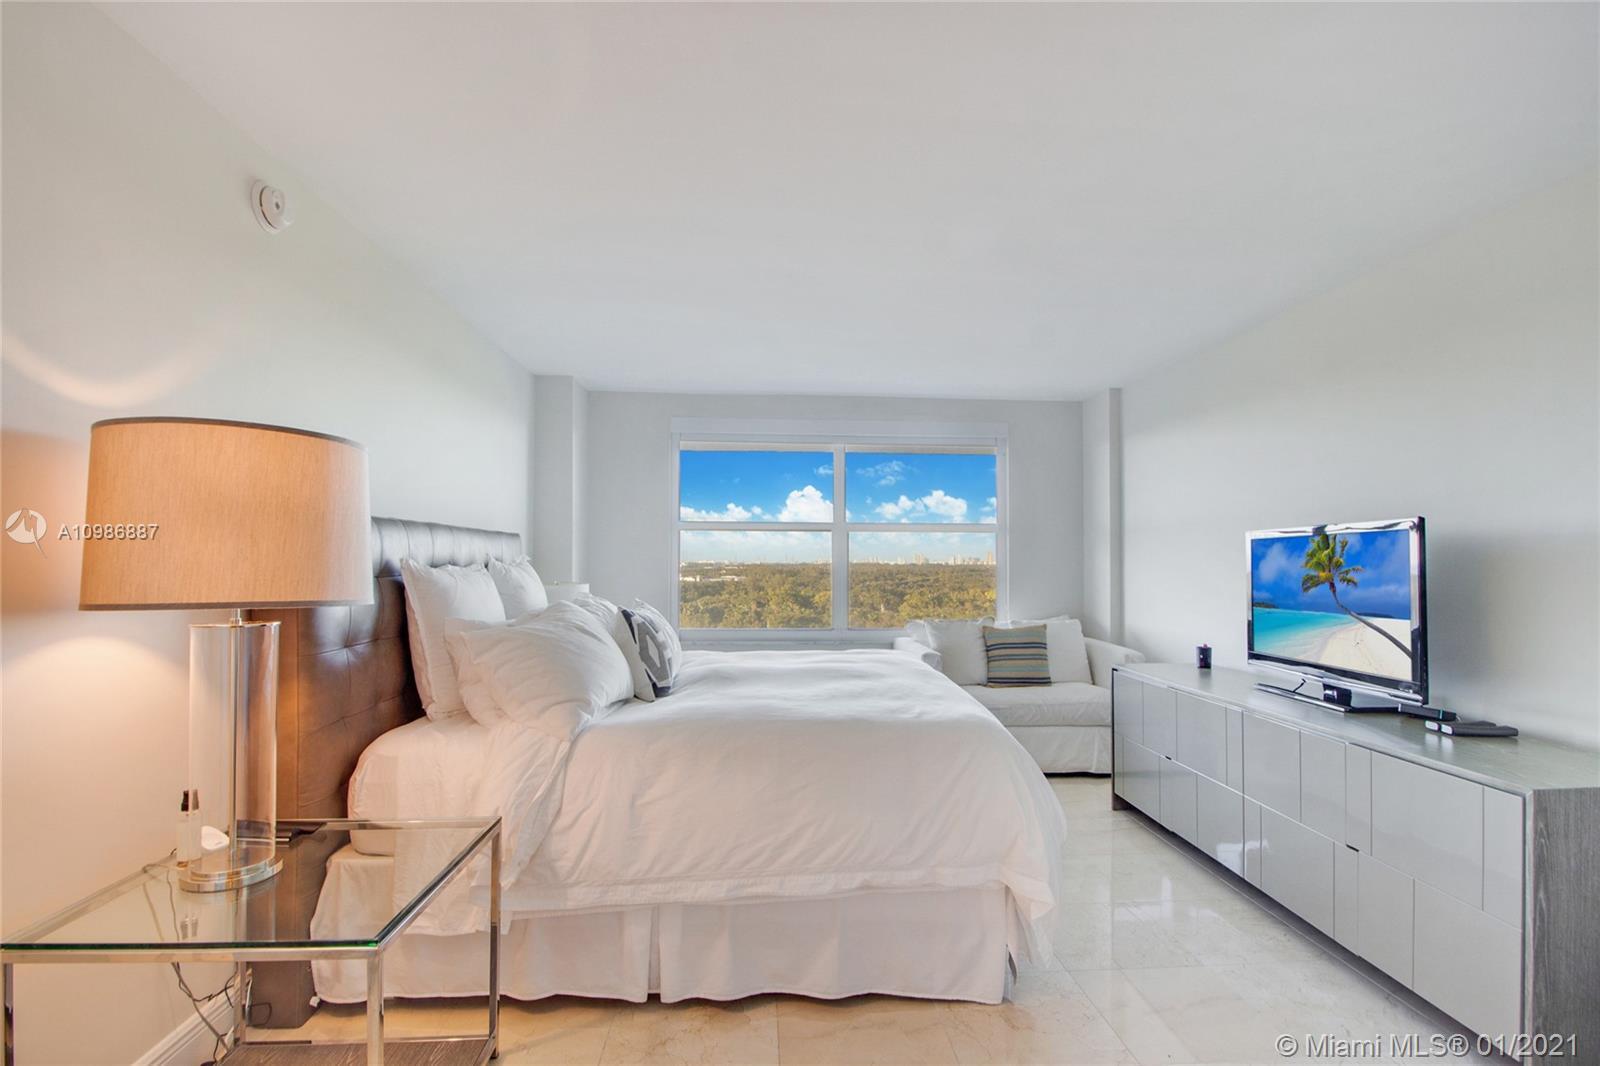 155 Ocean Lane Dr # 1210, Key Biscayne, Florida 33149, 4 Bedrooms Bedrooms, 1 Room Rooms,4 BathroomsBathrooms,Residential,For Sale,155 Ocean Lane Dr # 1210,A10986887